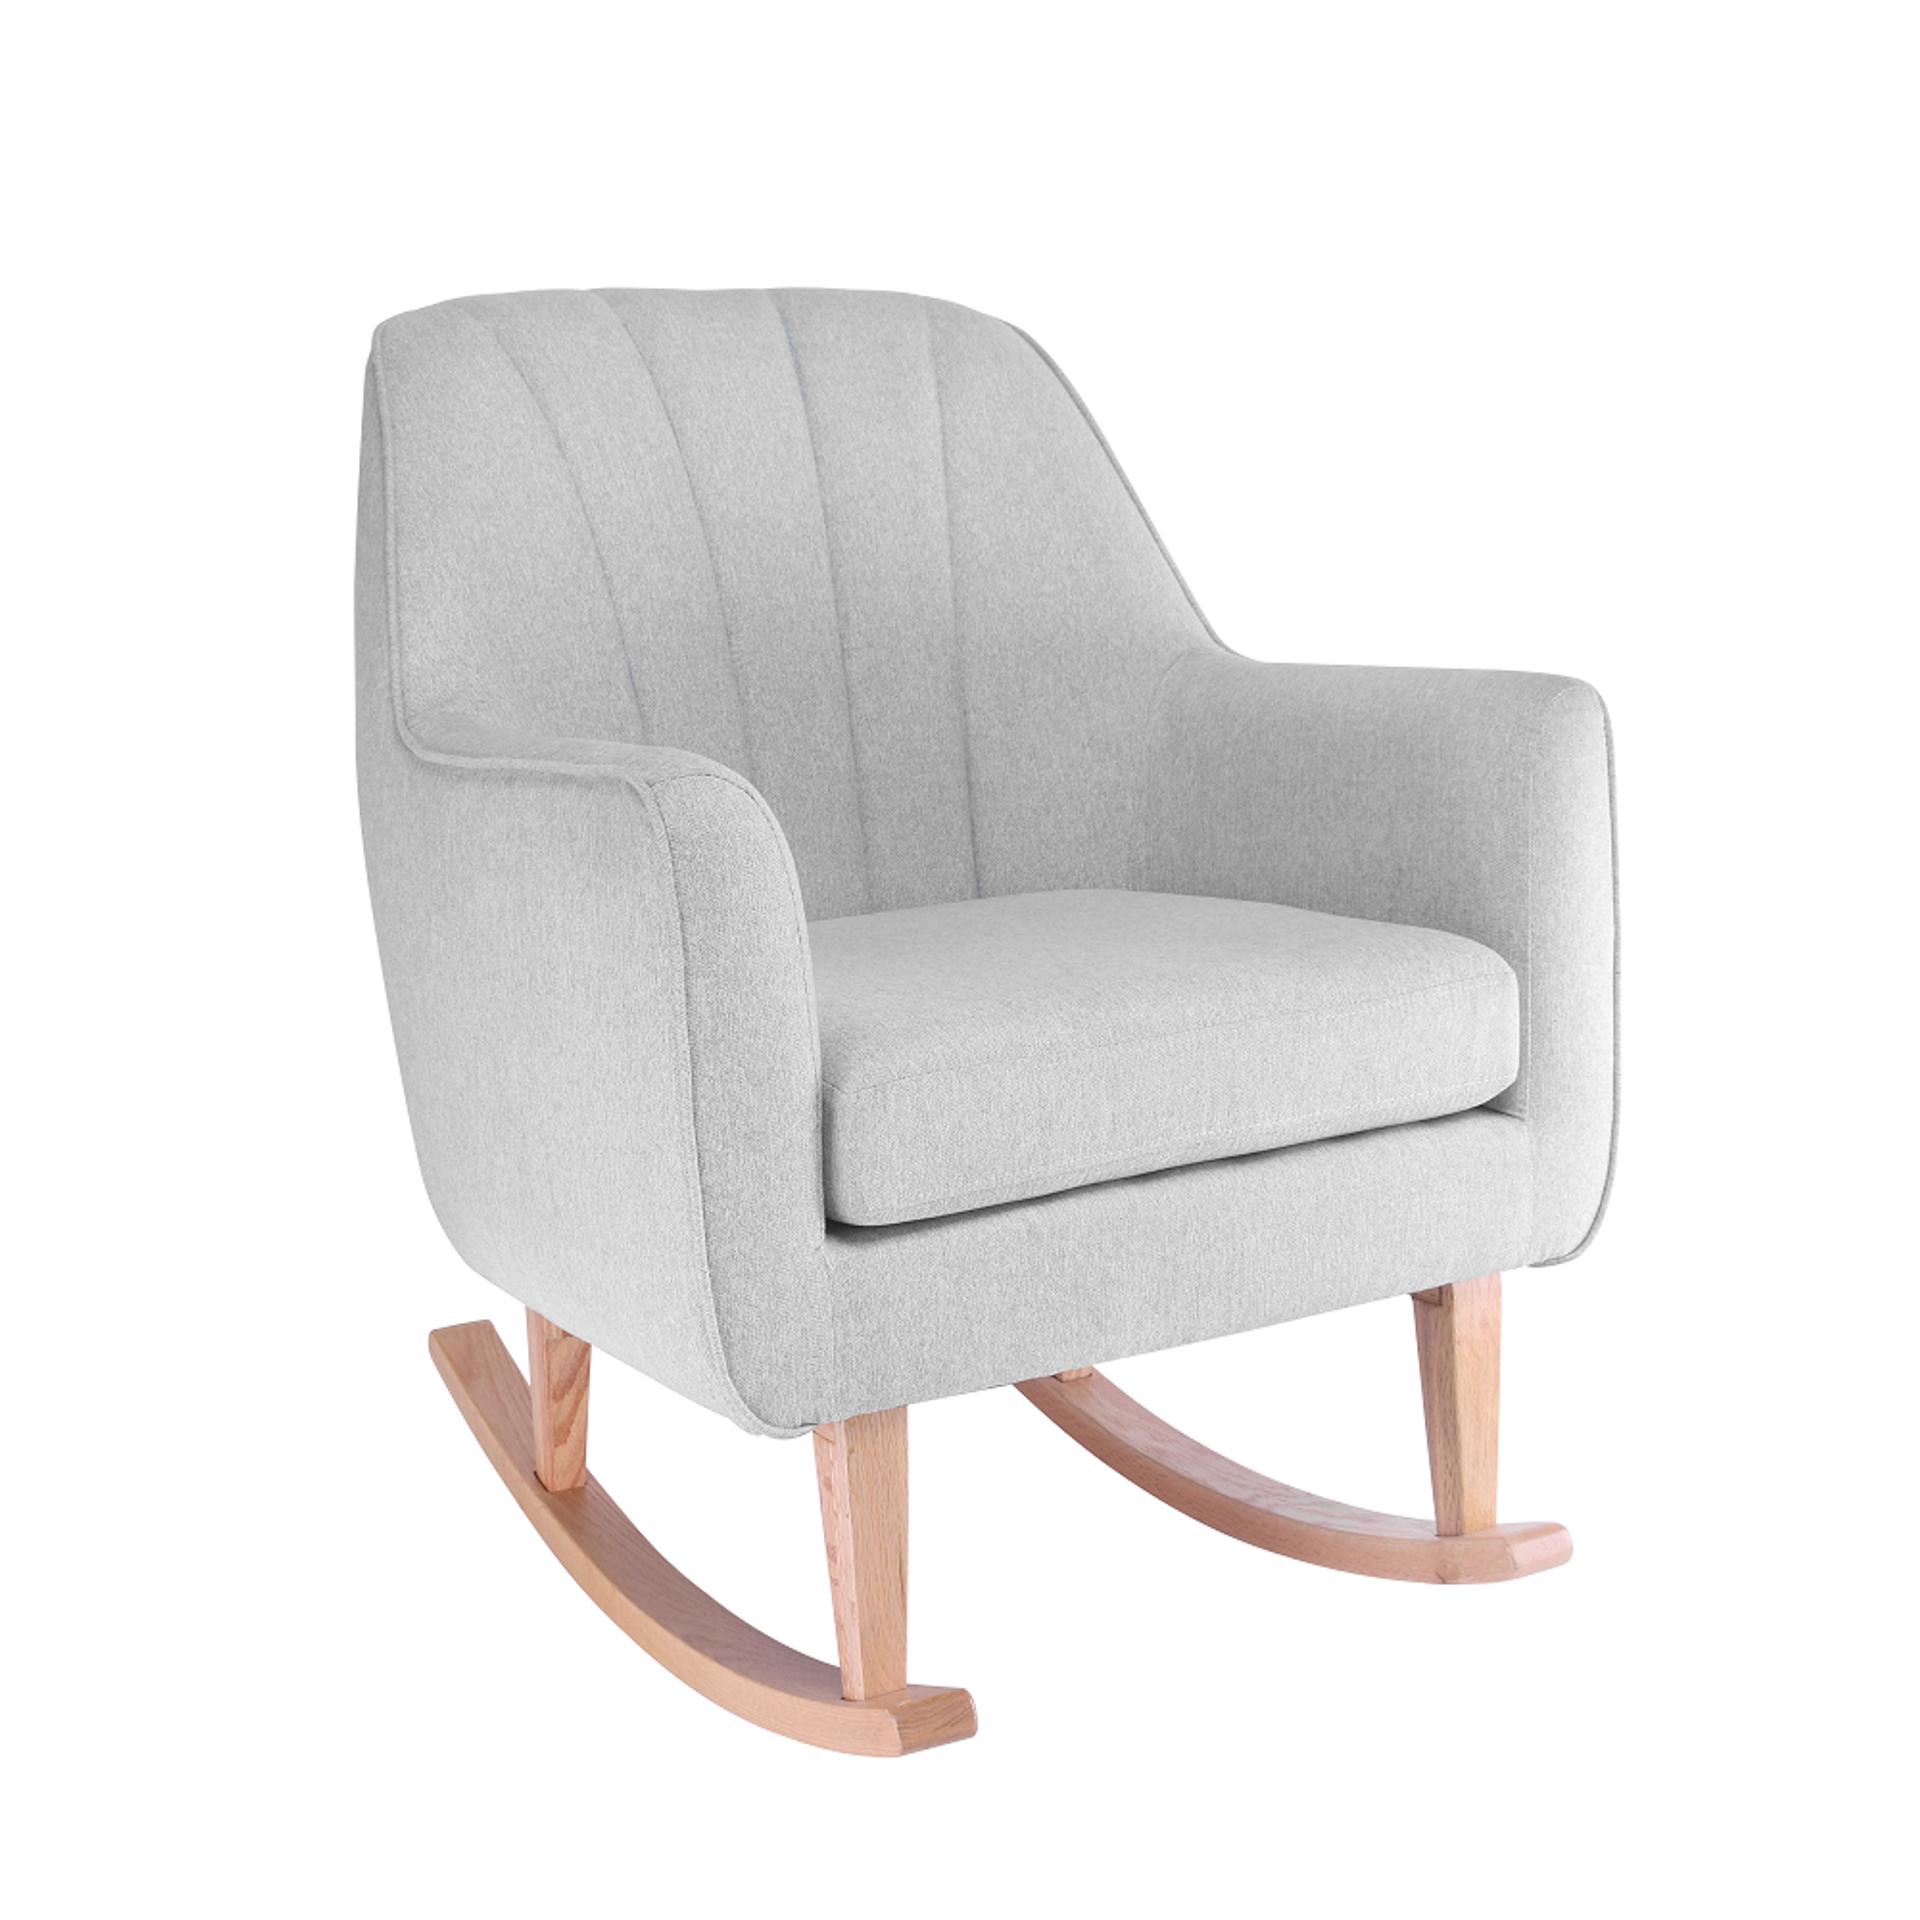 Tutti Bambini Noah Rocking Chair - Pebble